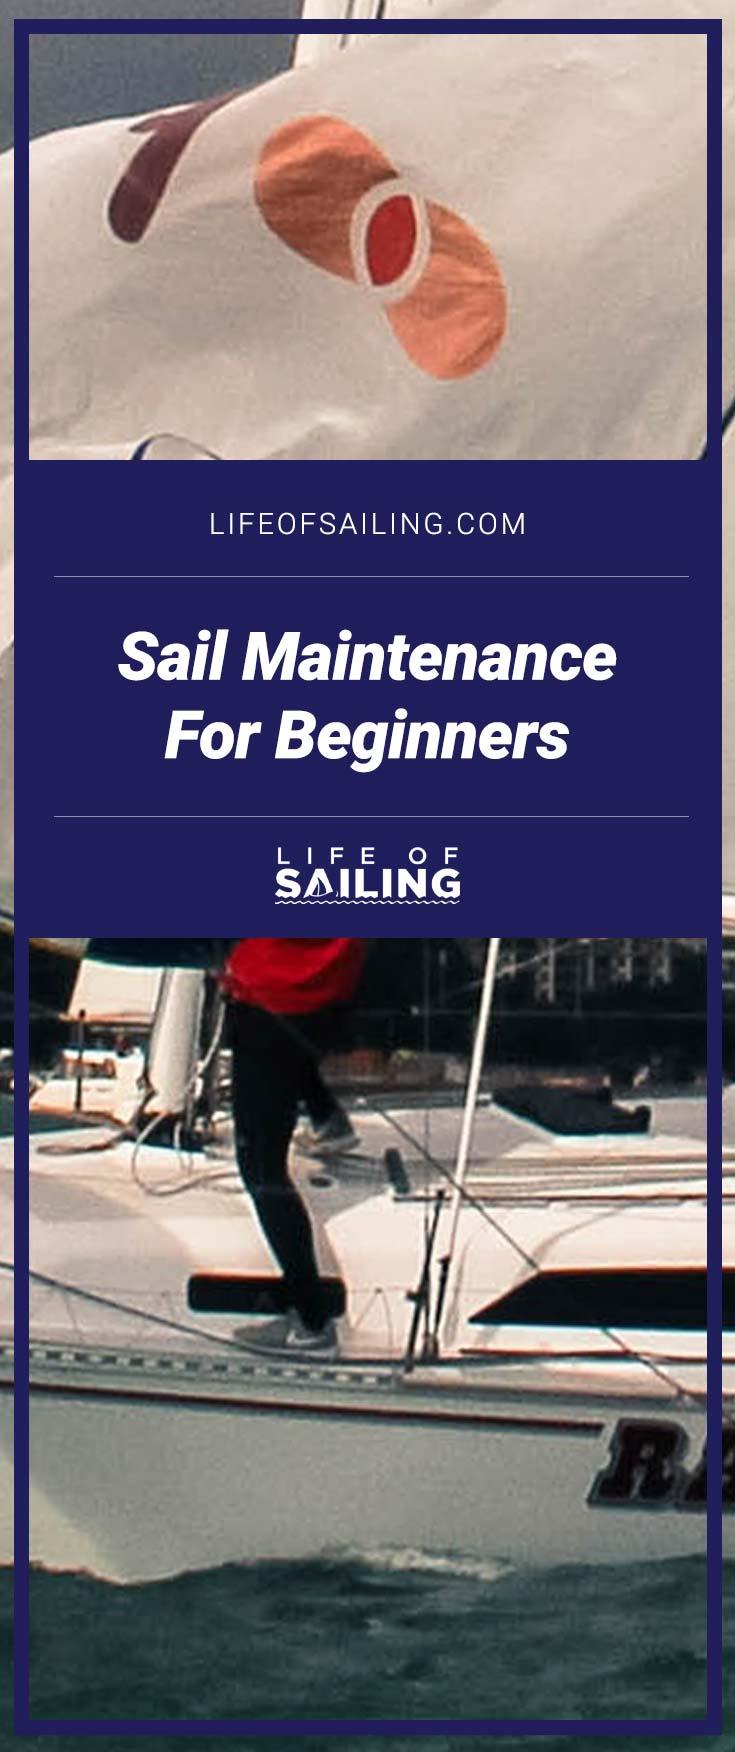 Sail Maintenance For Beginners